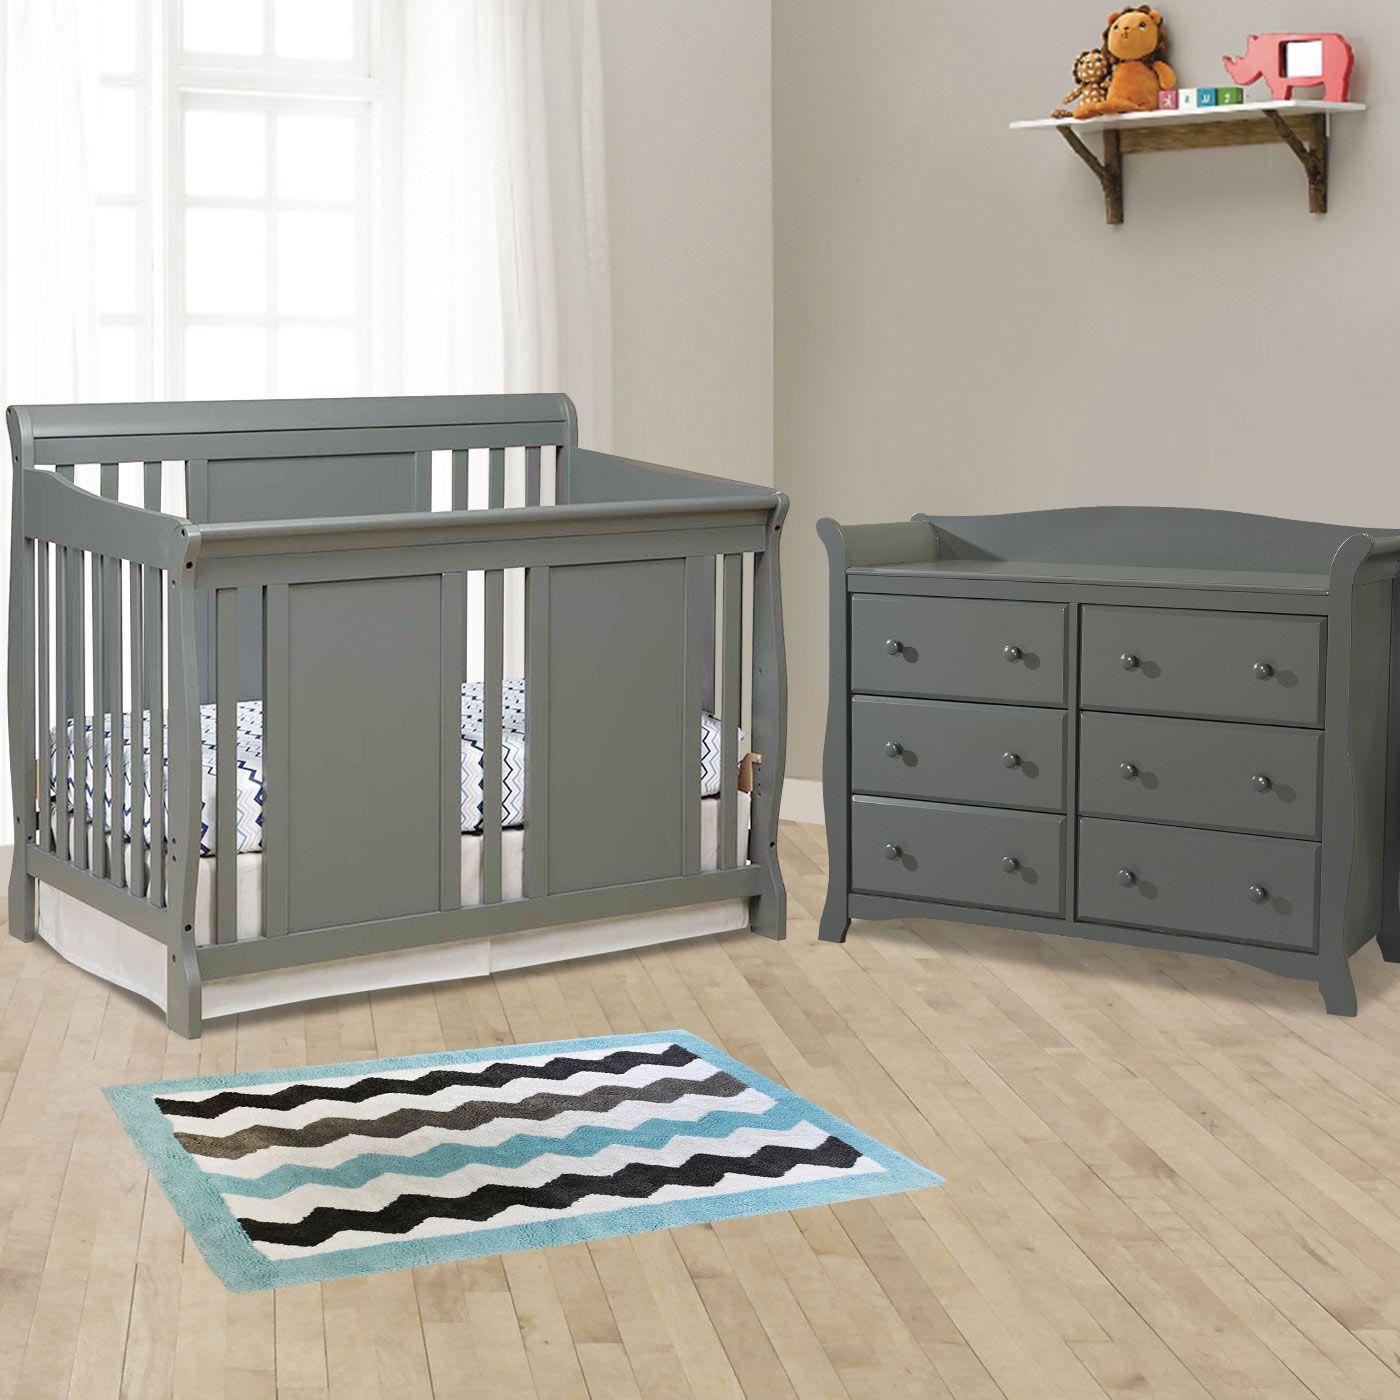 Storkcraft 2 Piece Nursery Set   Verona Convertible Crib And Avalon 6  Drawer Double Dresser In